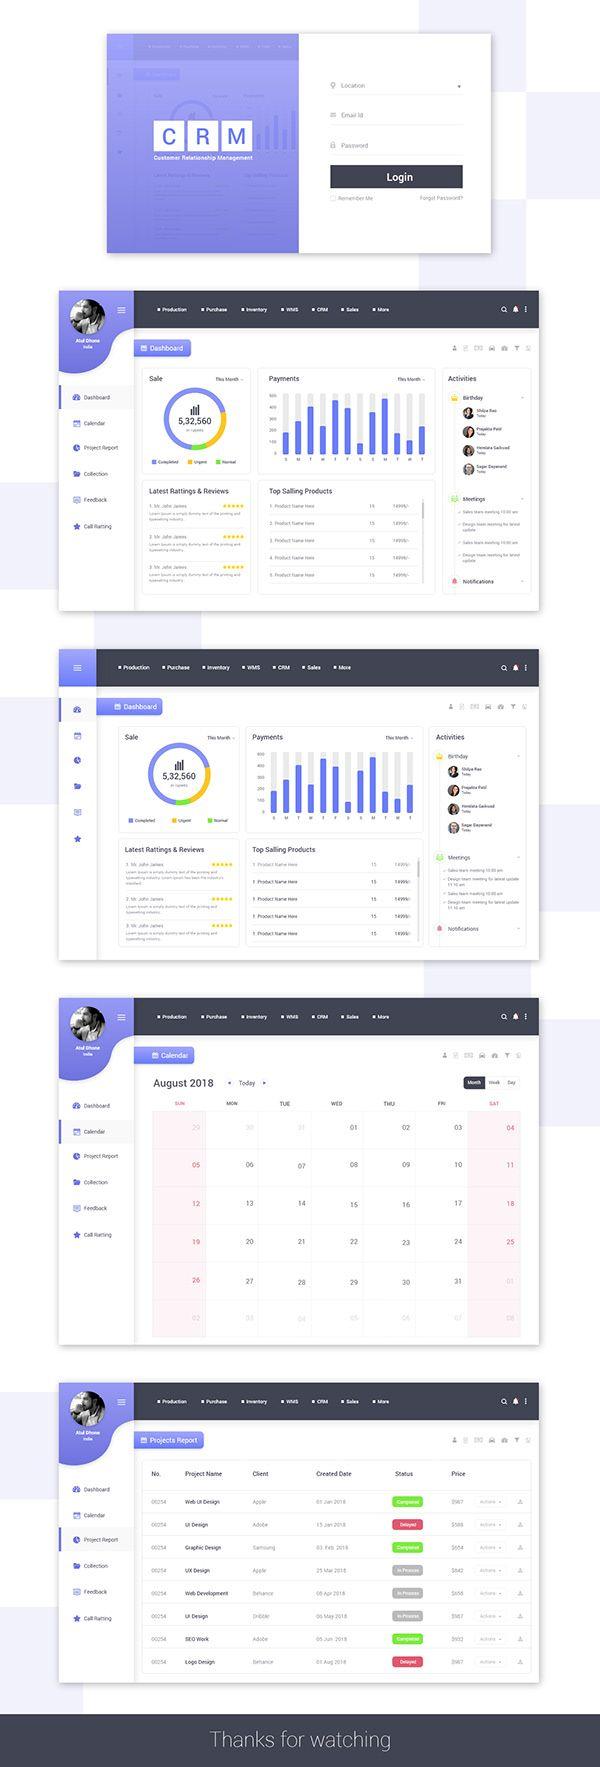 Web UI Dashboard Design for CRM on Behance #interfacedesign